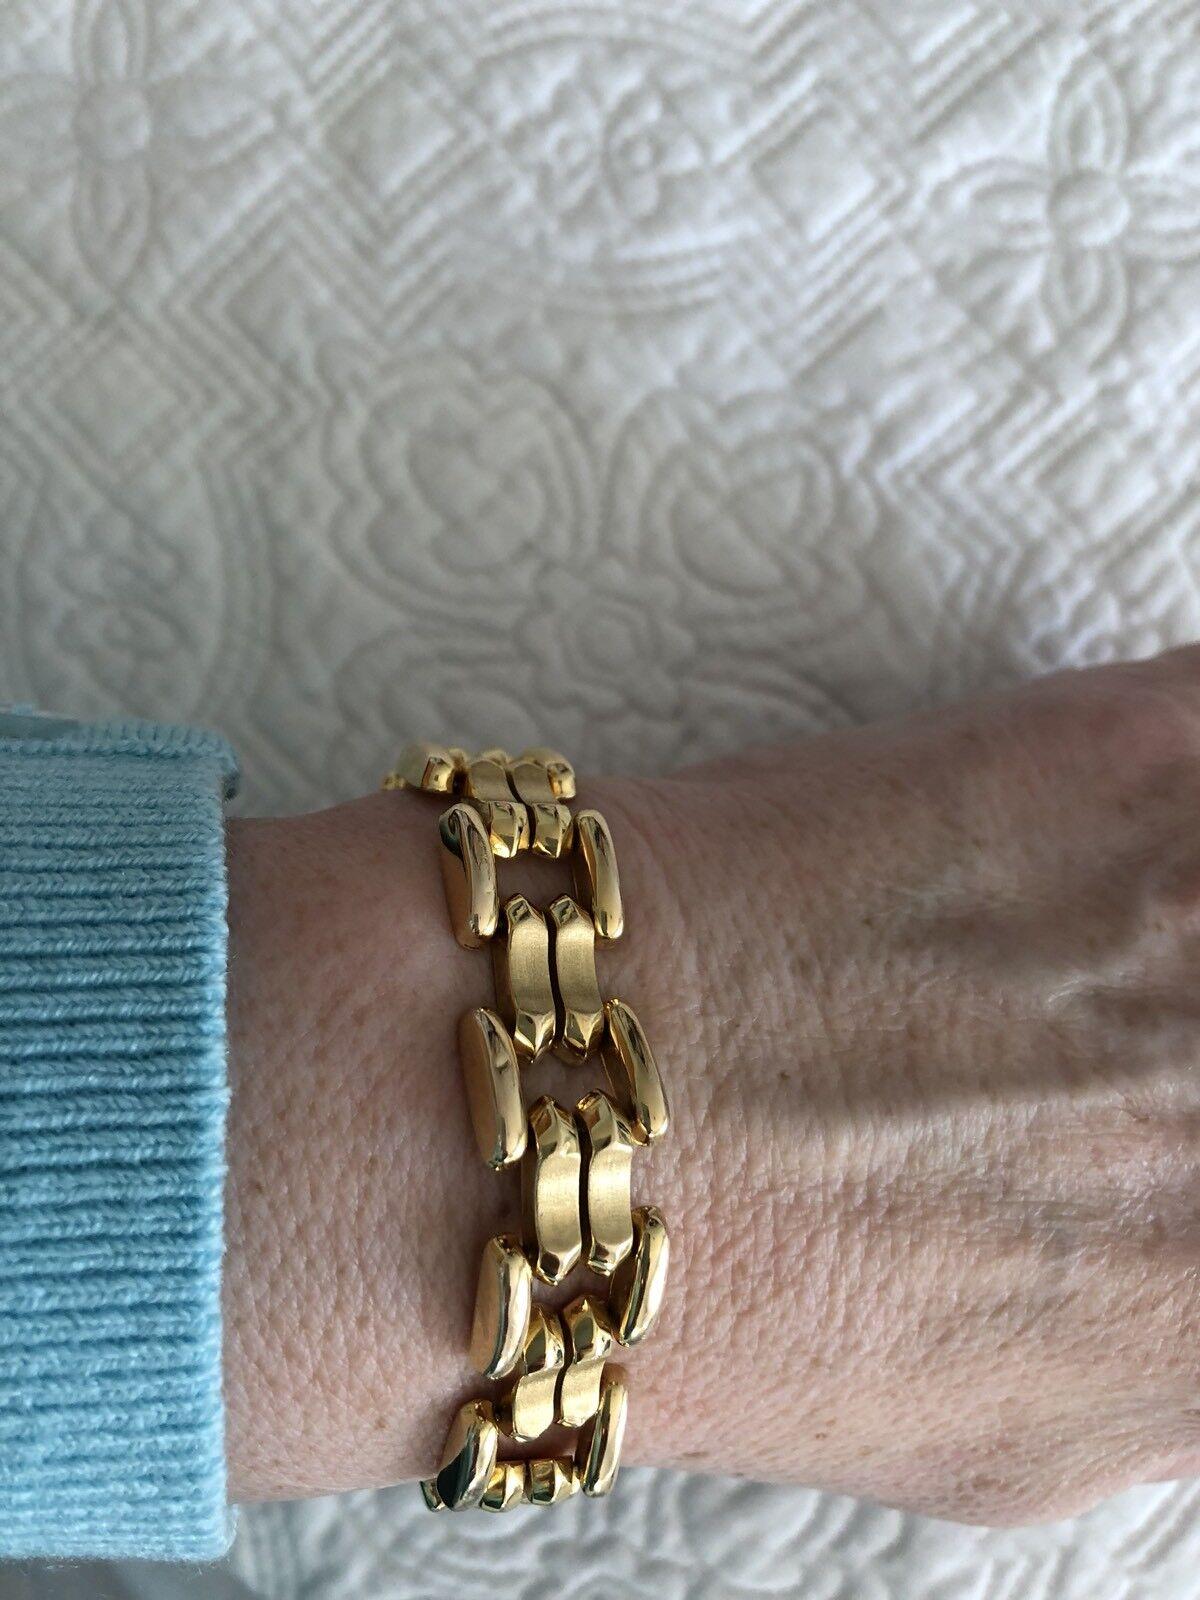 14 KT YELLOW gold BRACELET 21 GRAMS 7.25 Inch ️